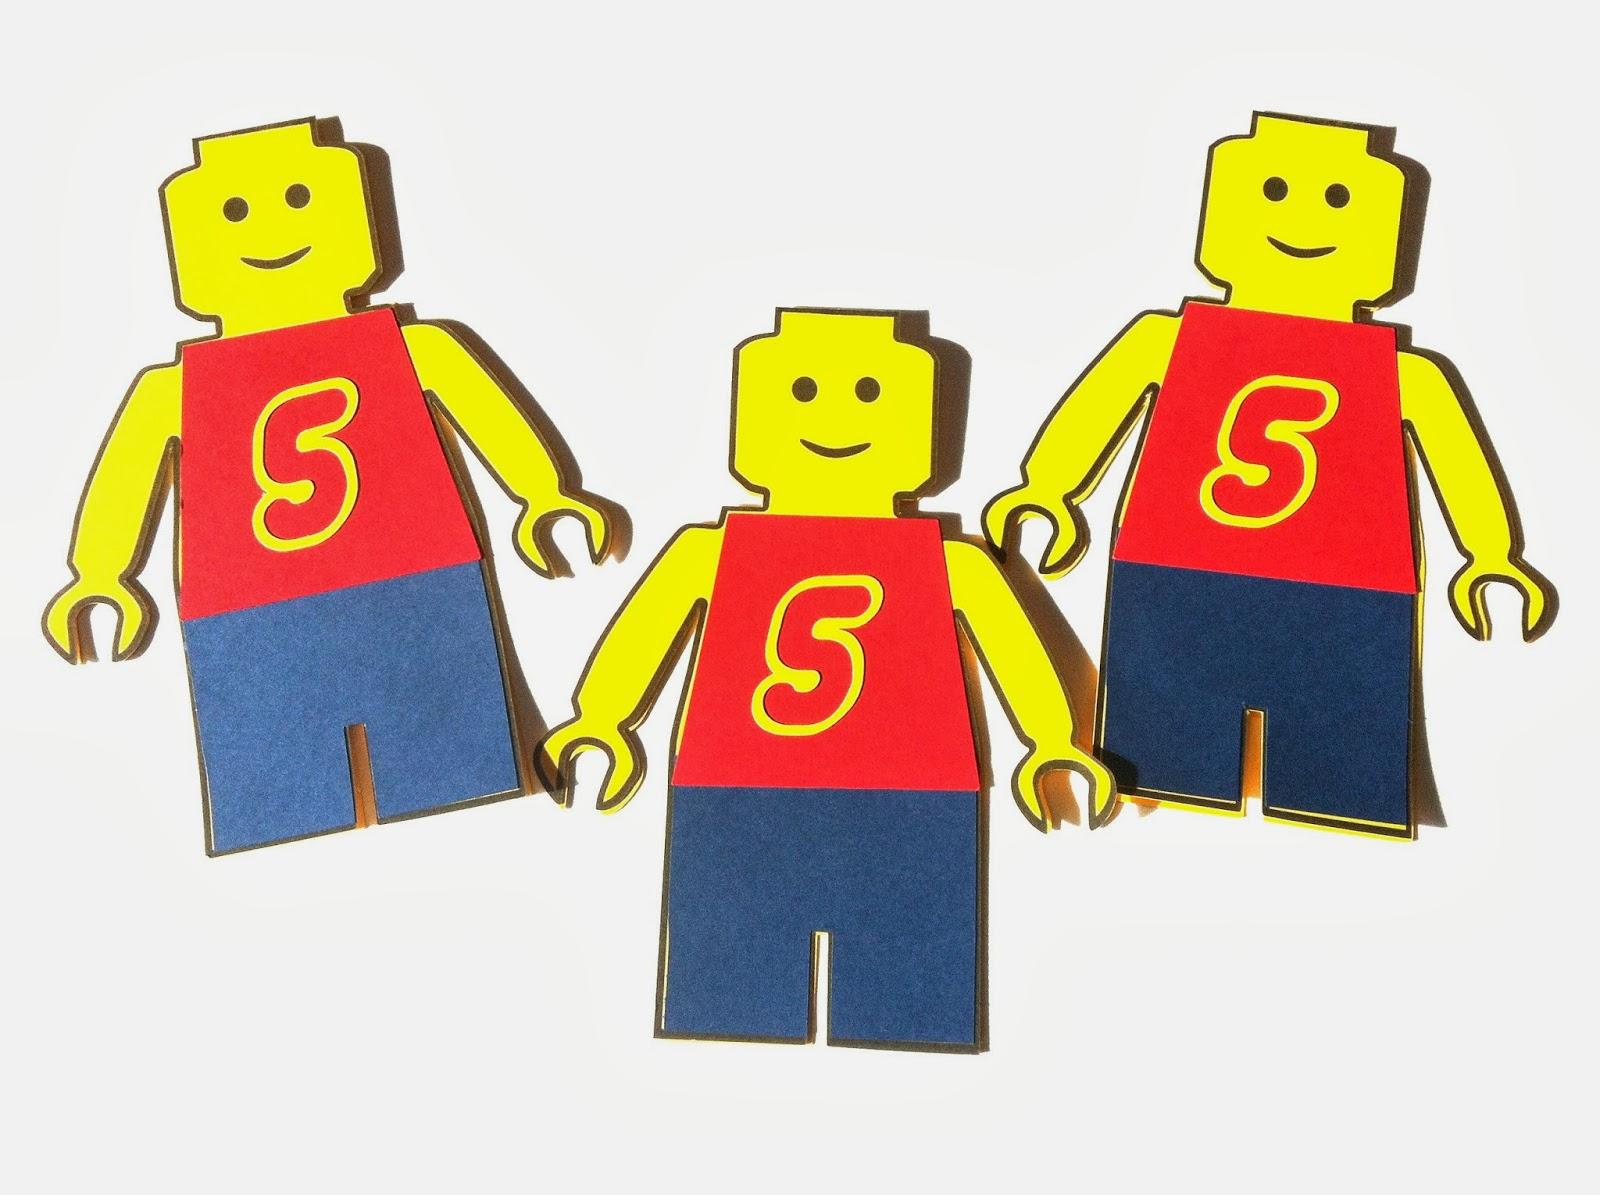 lego man birthday - photo #15